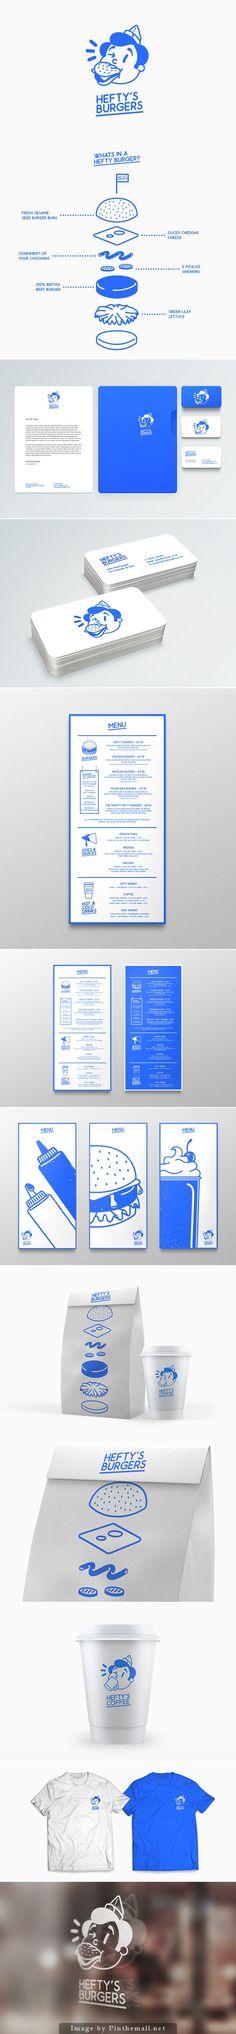 Hefty's Burgers - #branding #brands #identity #design